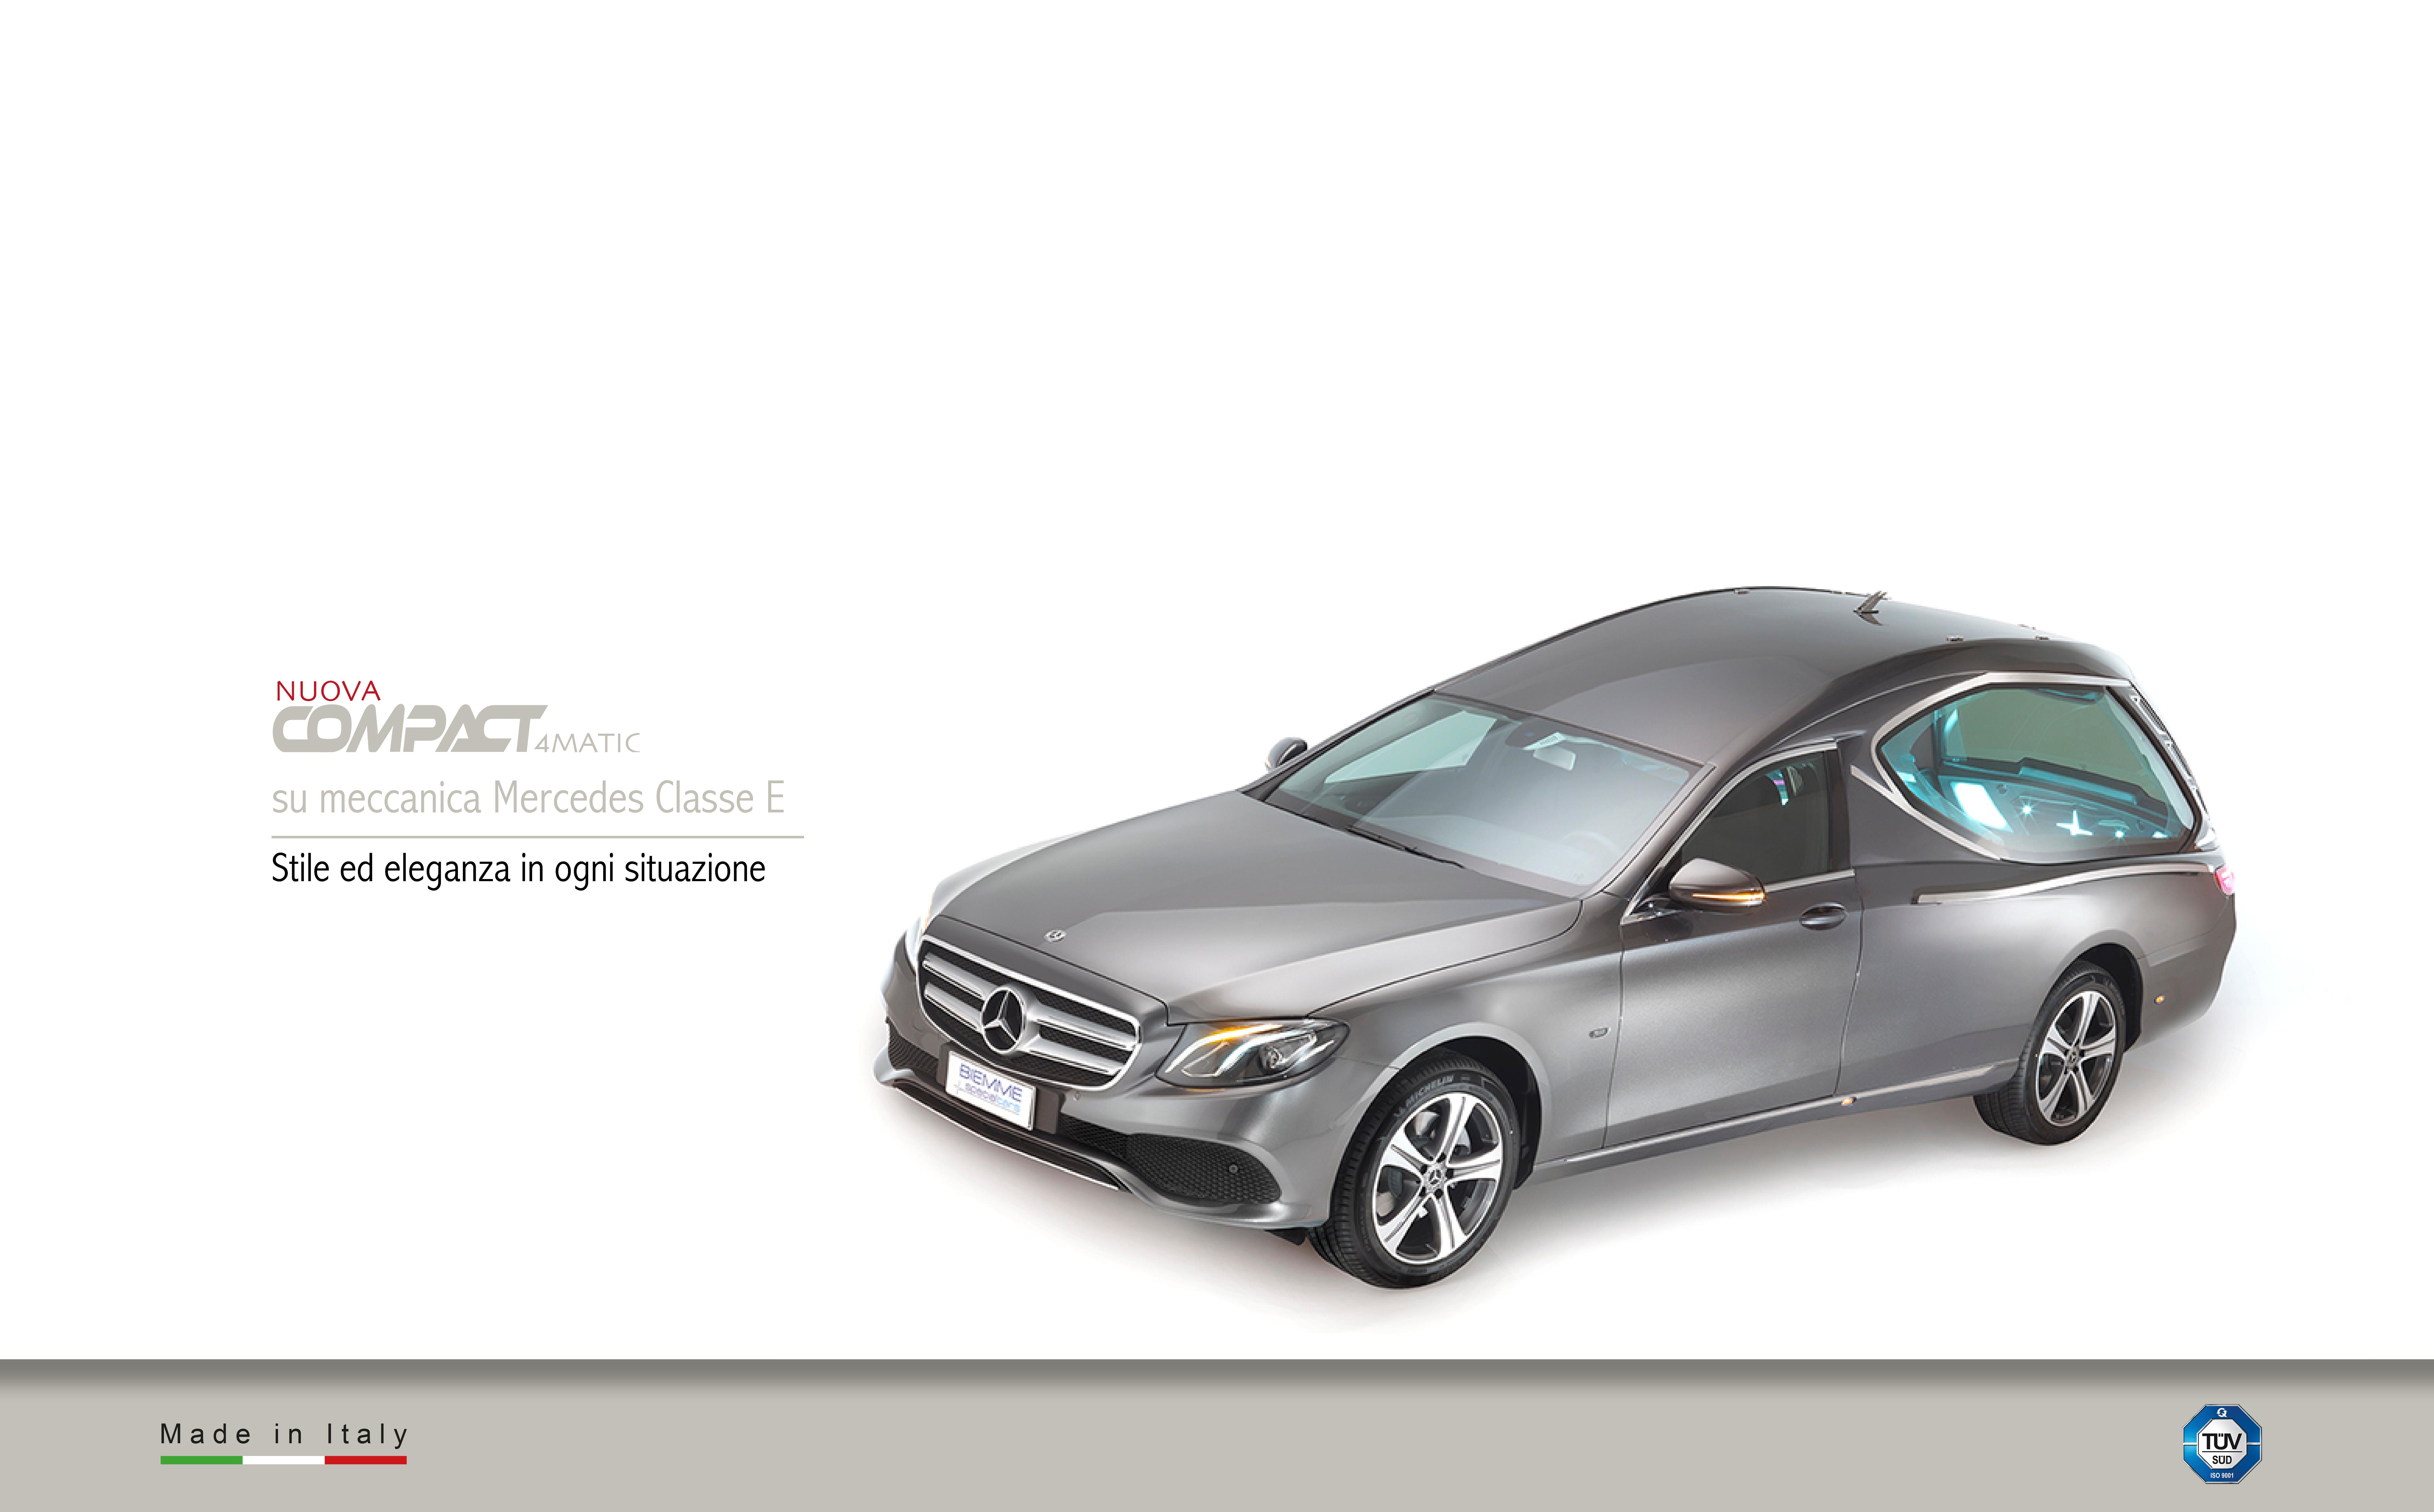 Compact Corbillard meccanical Mercedes Benz Cls Coupè